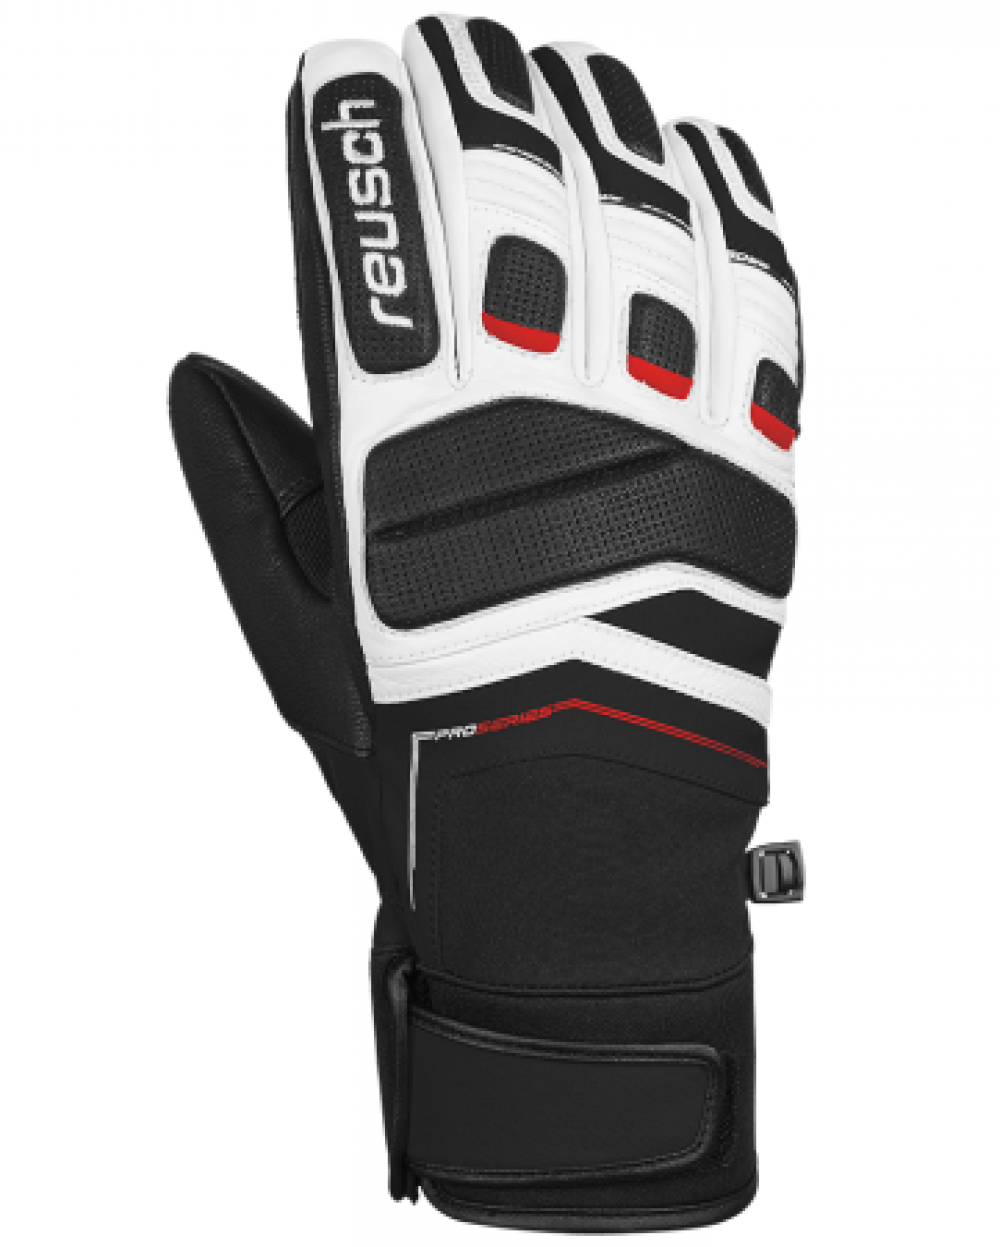 f3b6e388e Lyžiarske rukavice REUSCH Profi SL Black / White - 18/19